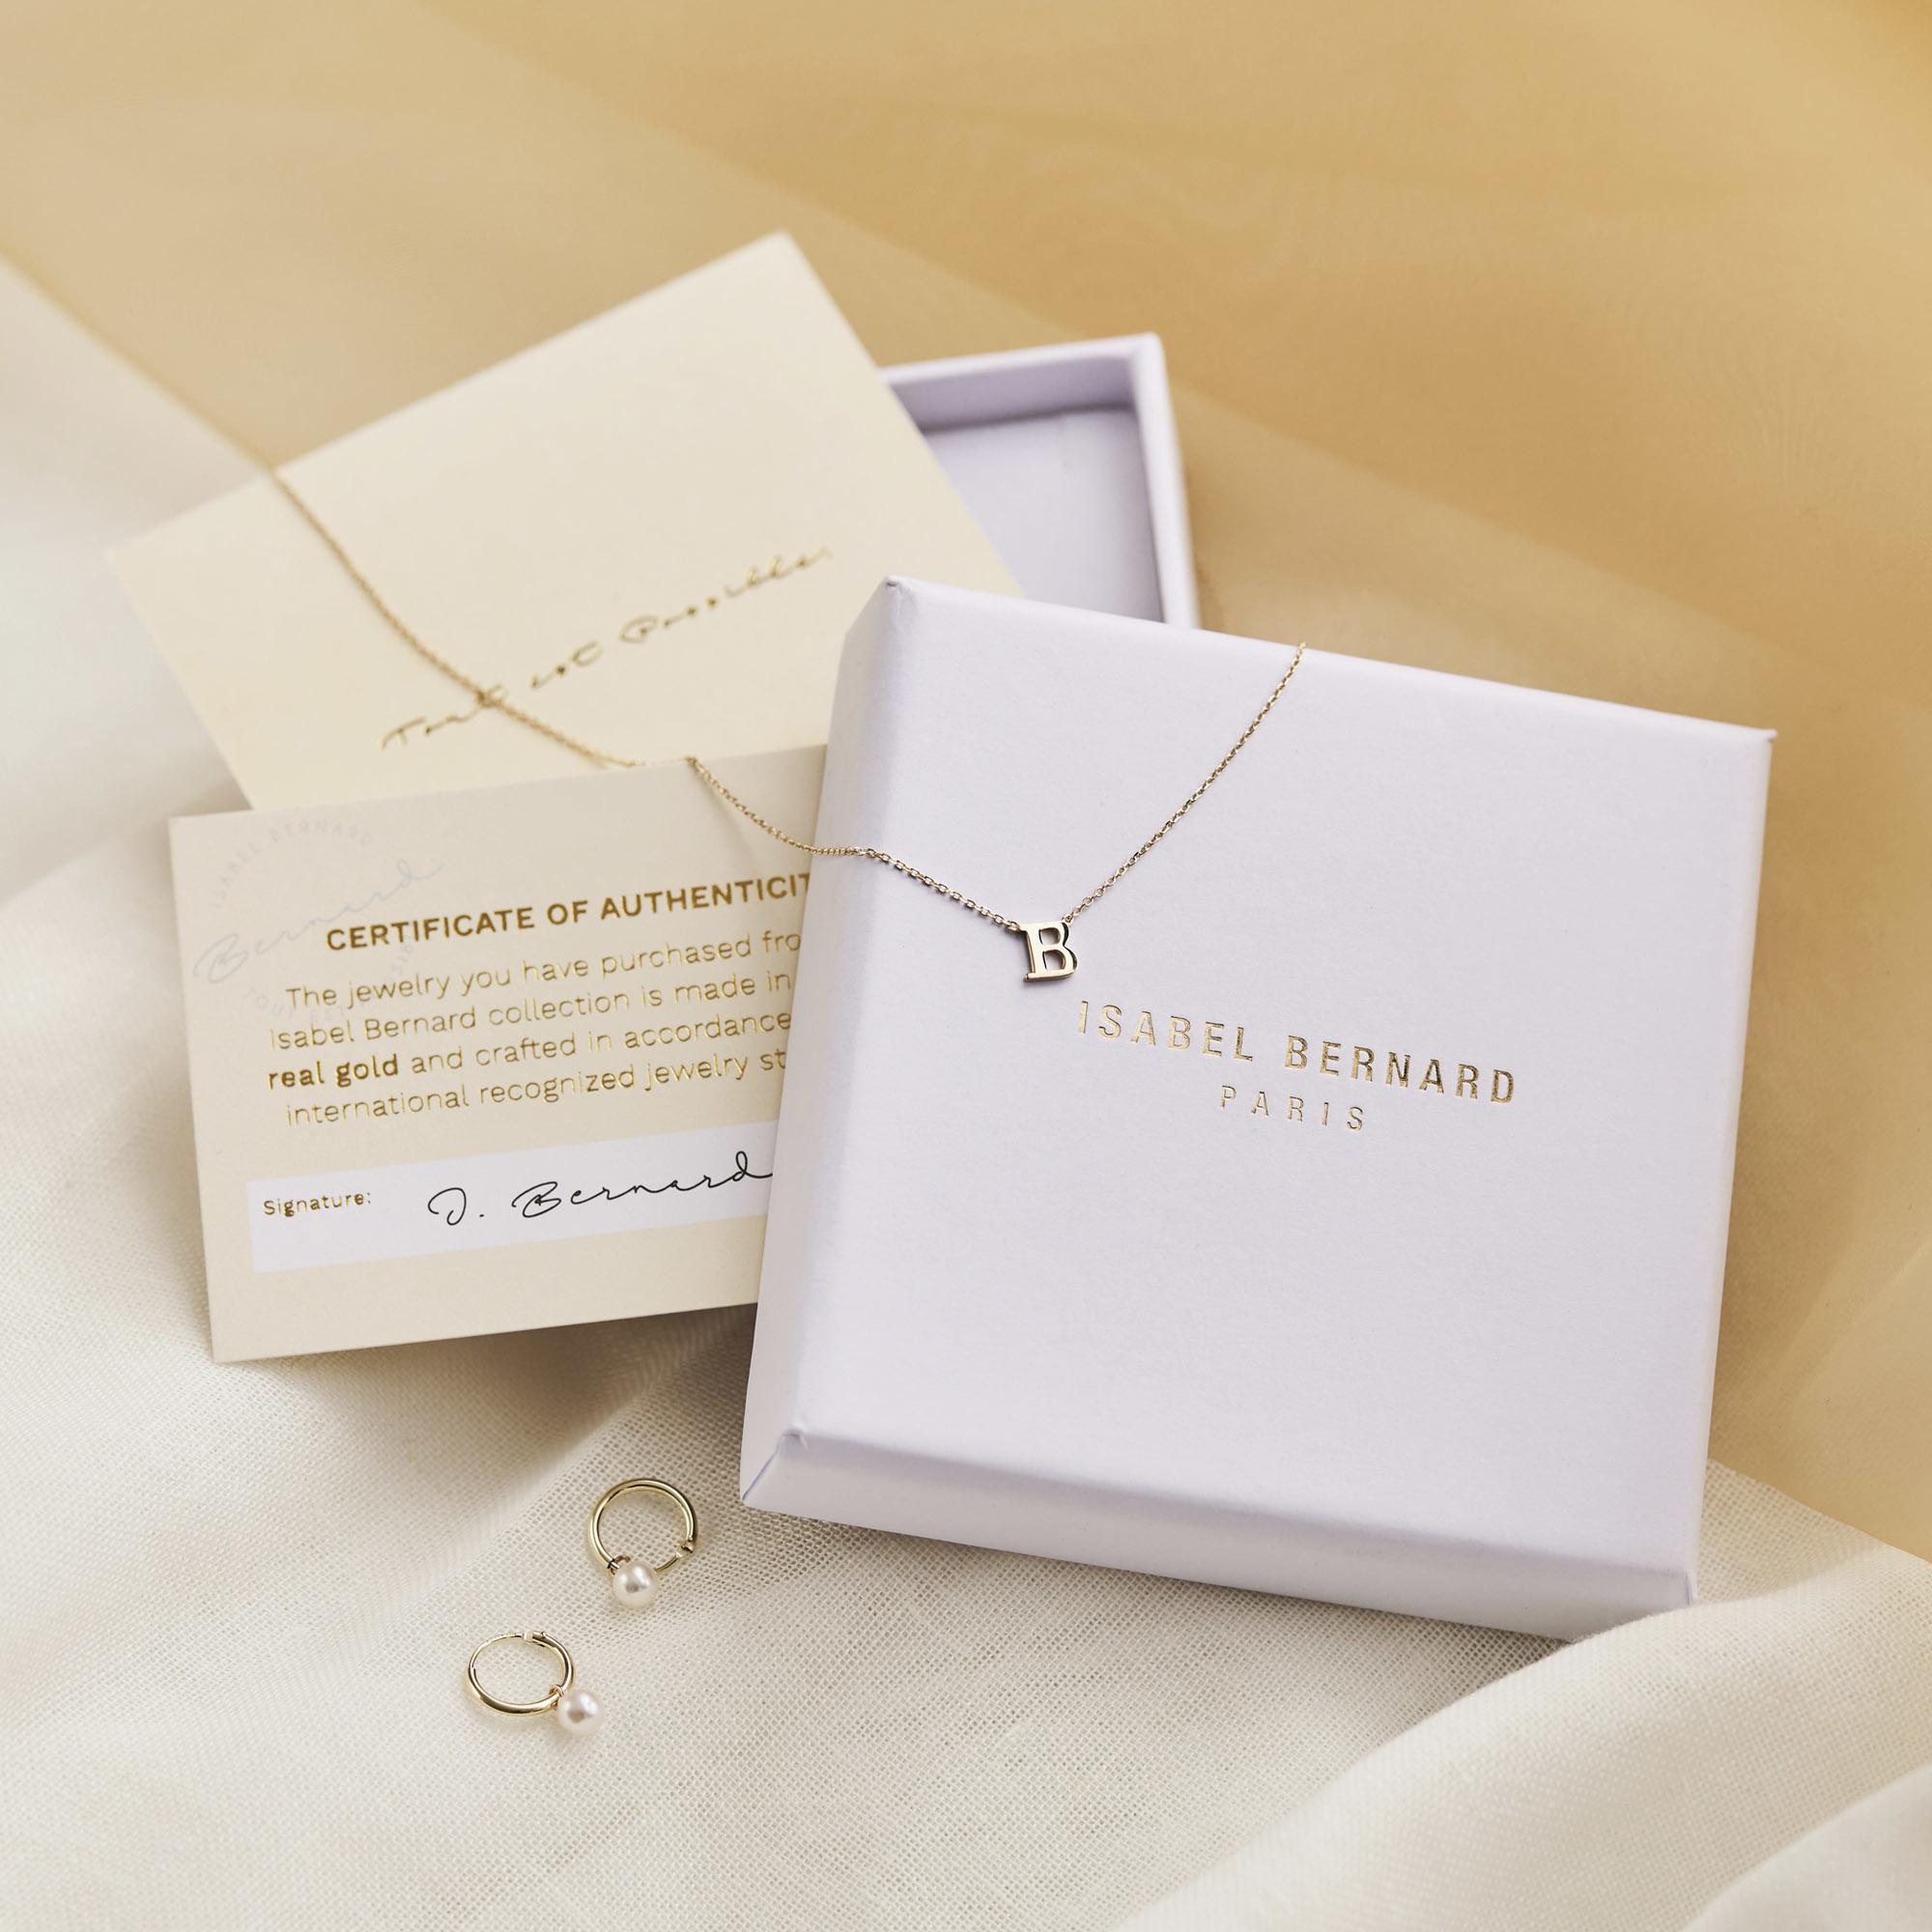 Isabel Bernard La Concorde Chloé 14 karat rose gold initial collier with letter